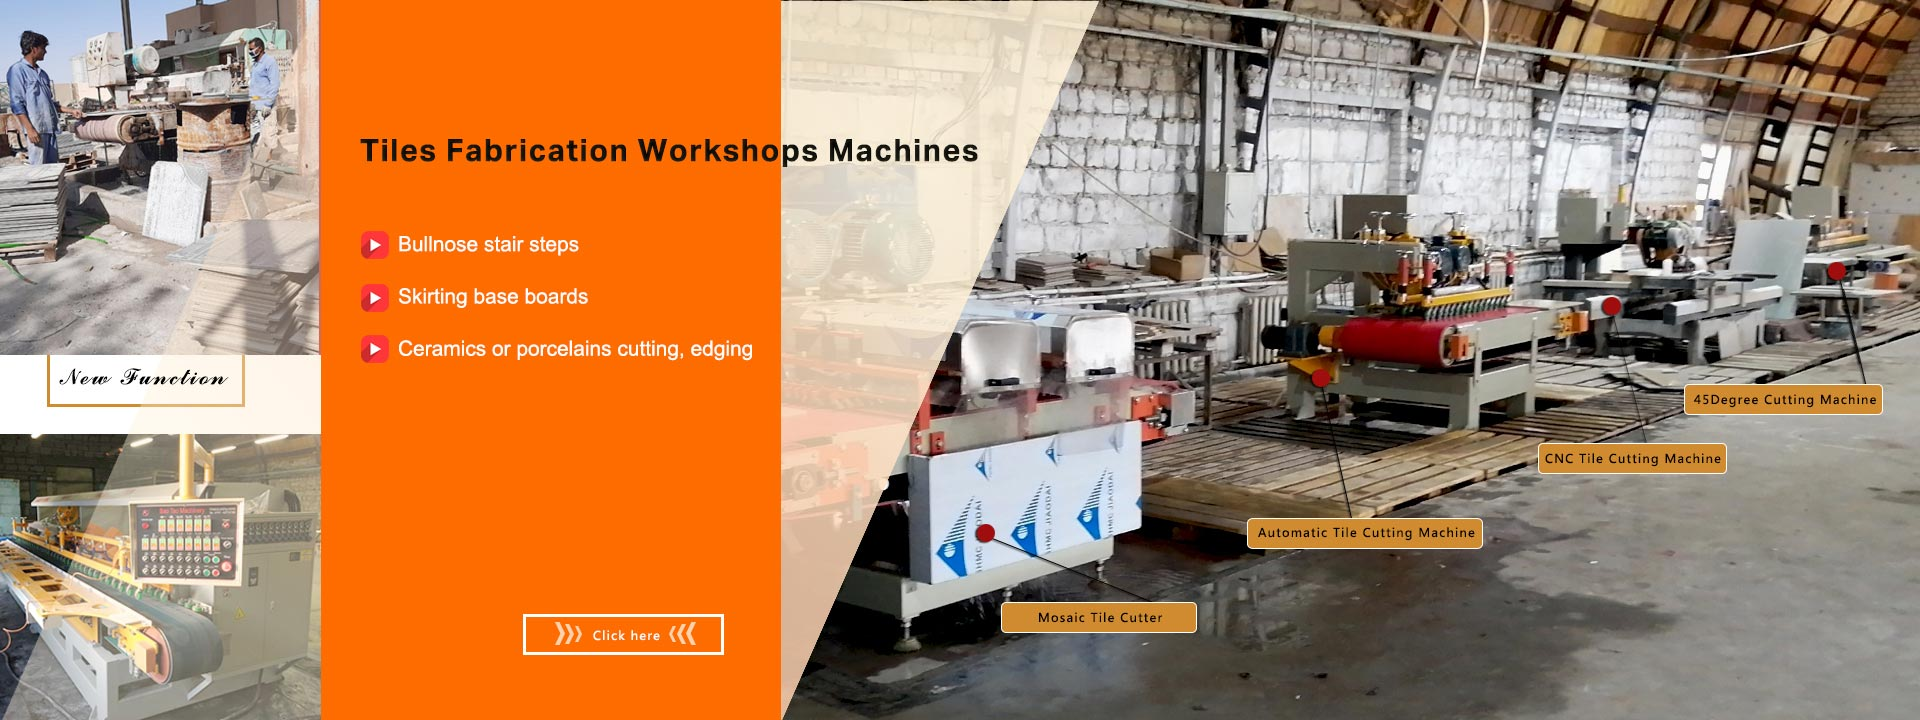 Waterjet medallion workshops machines Marble / ceramic inlay pattern panels?